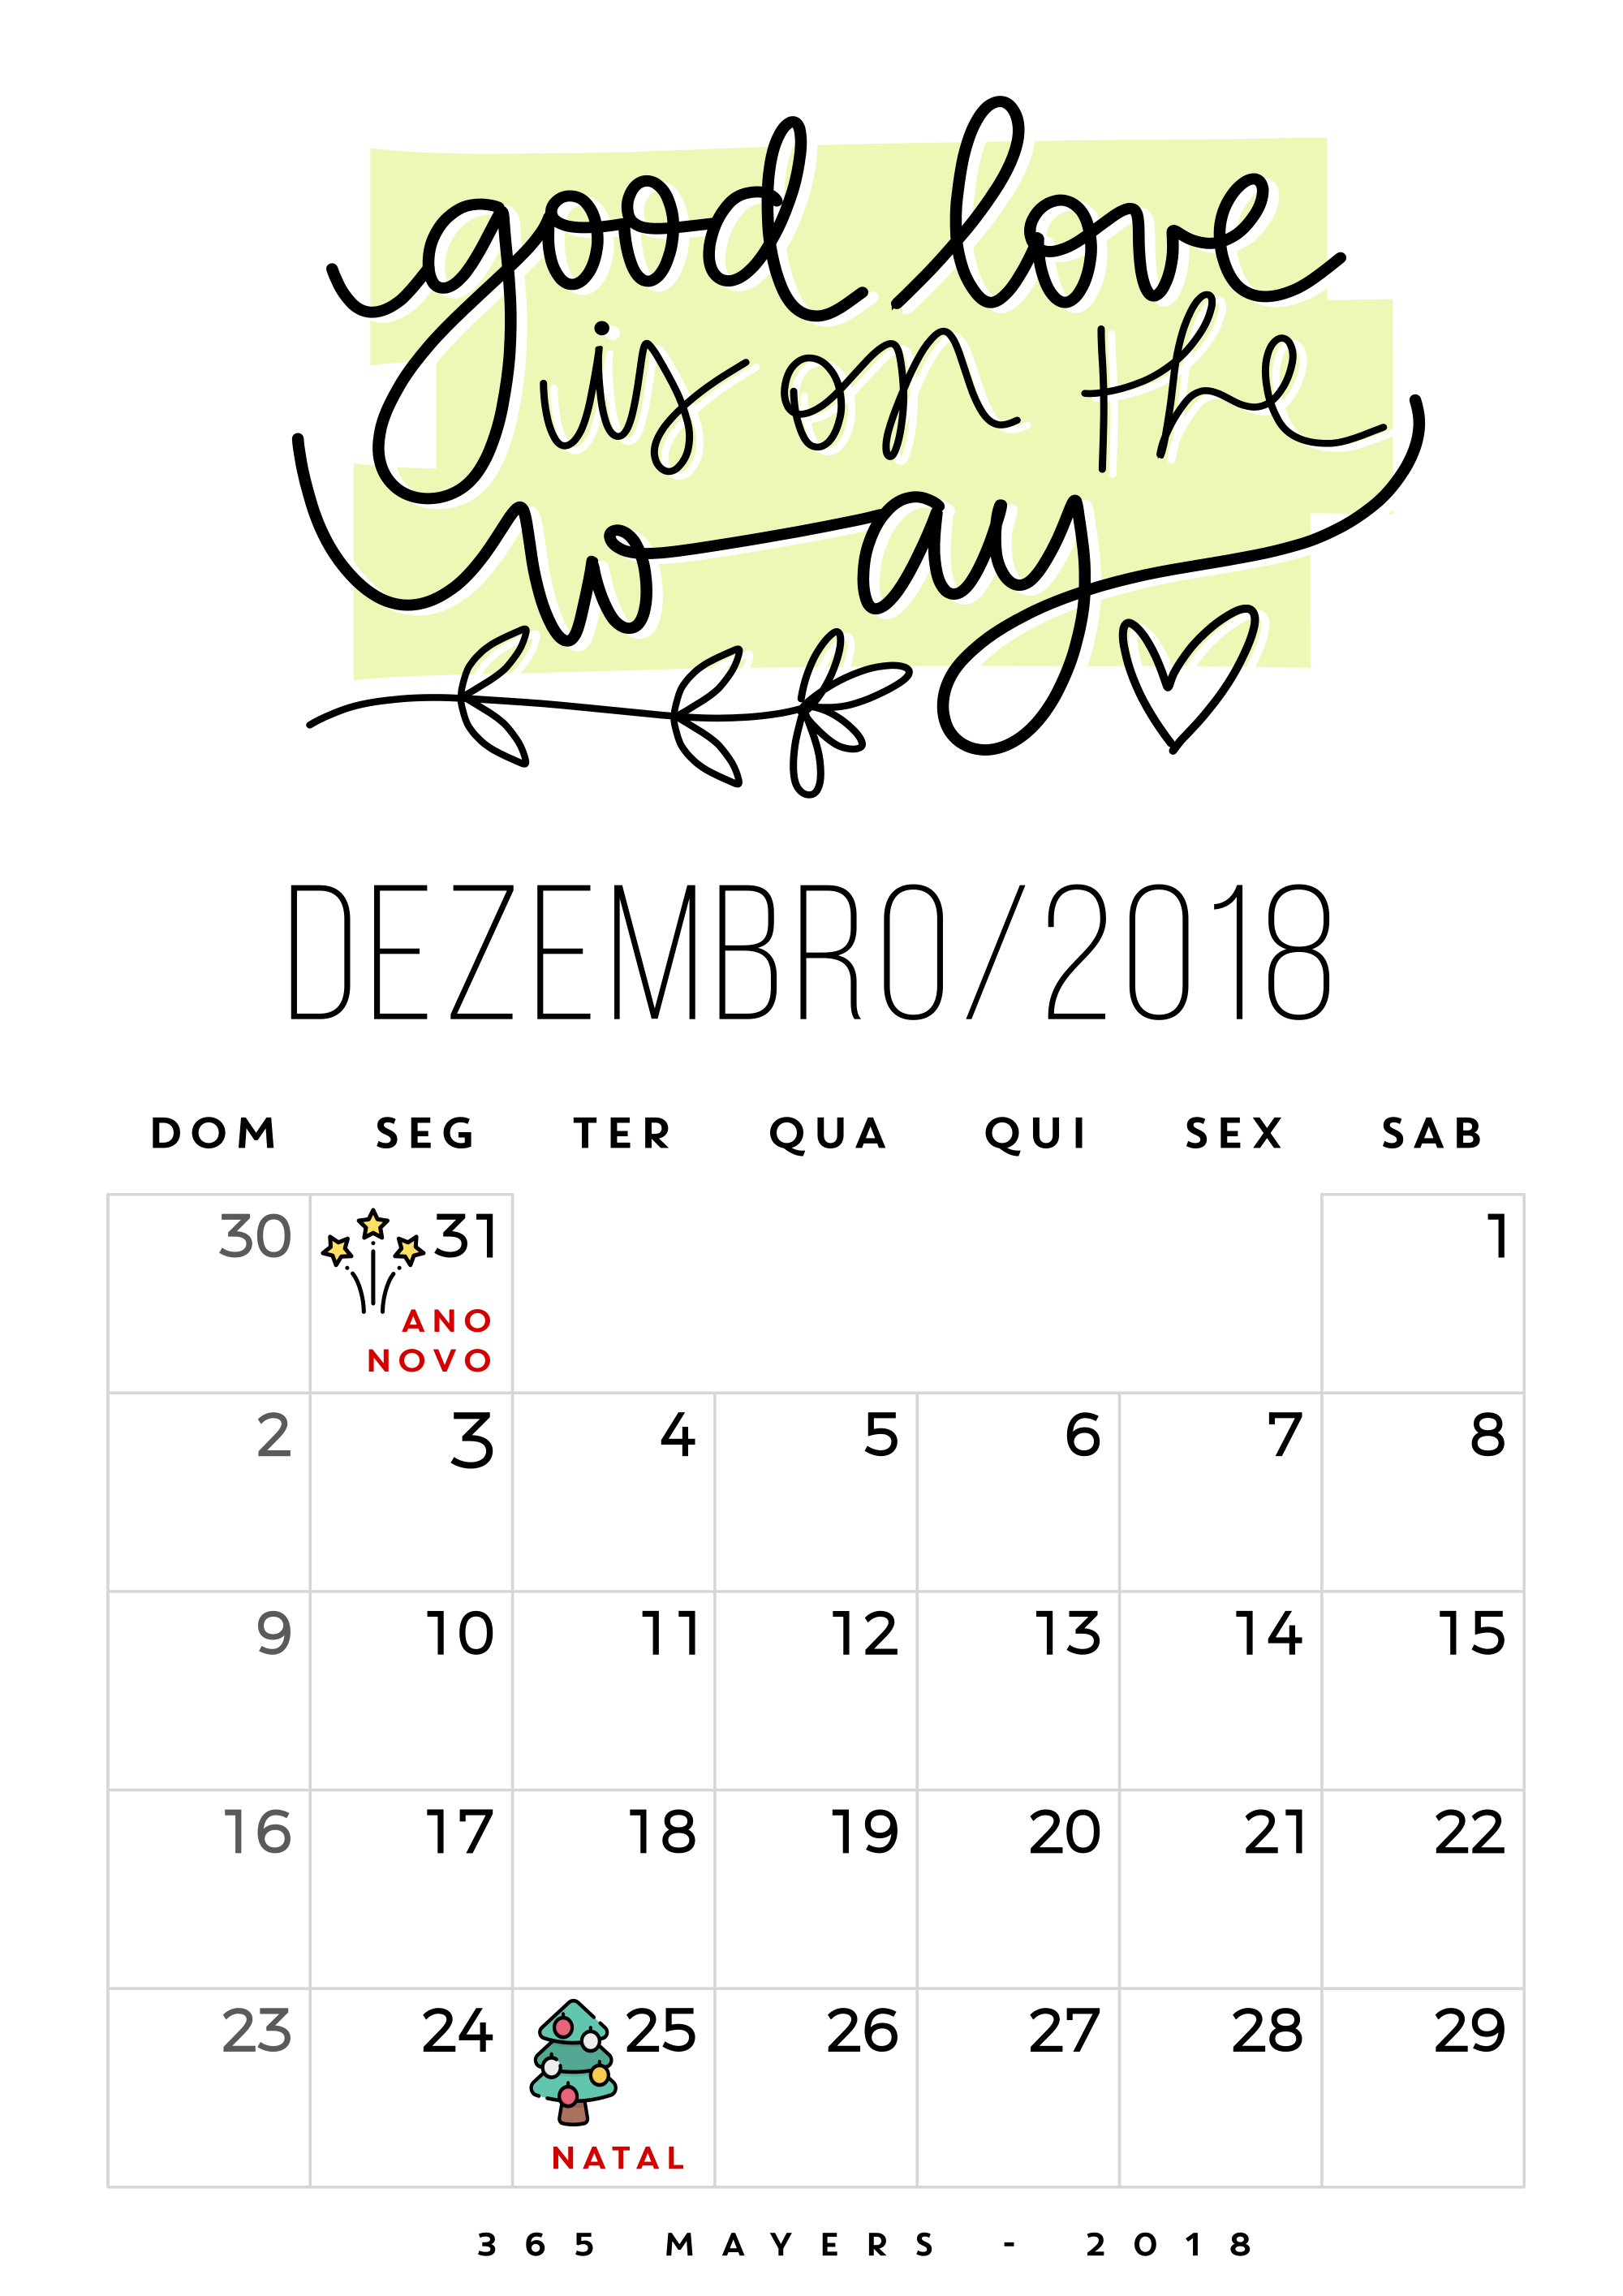 Calendario 365.Calendario 365 Mayers 2018 2 John Mayer John John